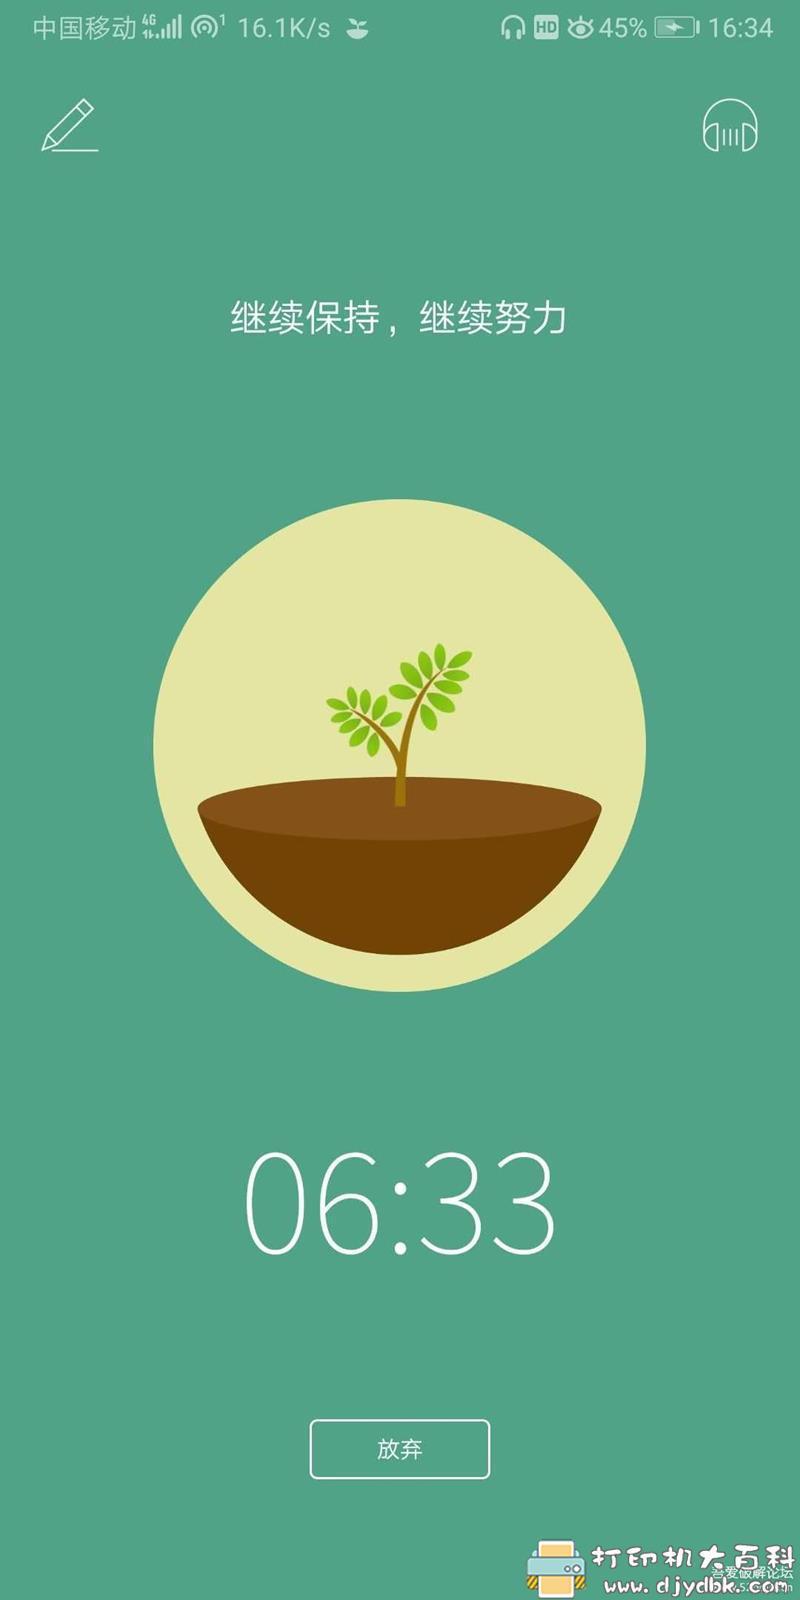 [Android]辅助你放下手机专注工作的app:Forest专注森林 v4.16.1 免费专业版图片 No.2